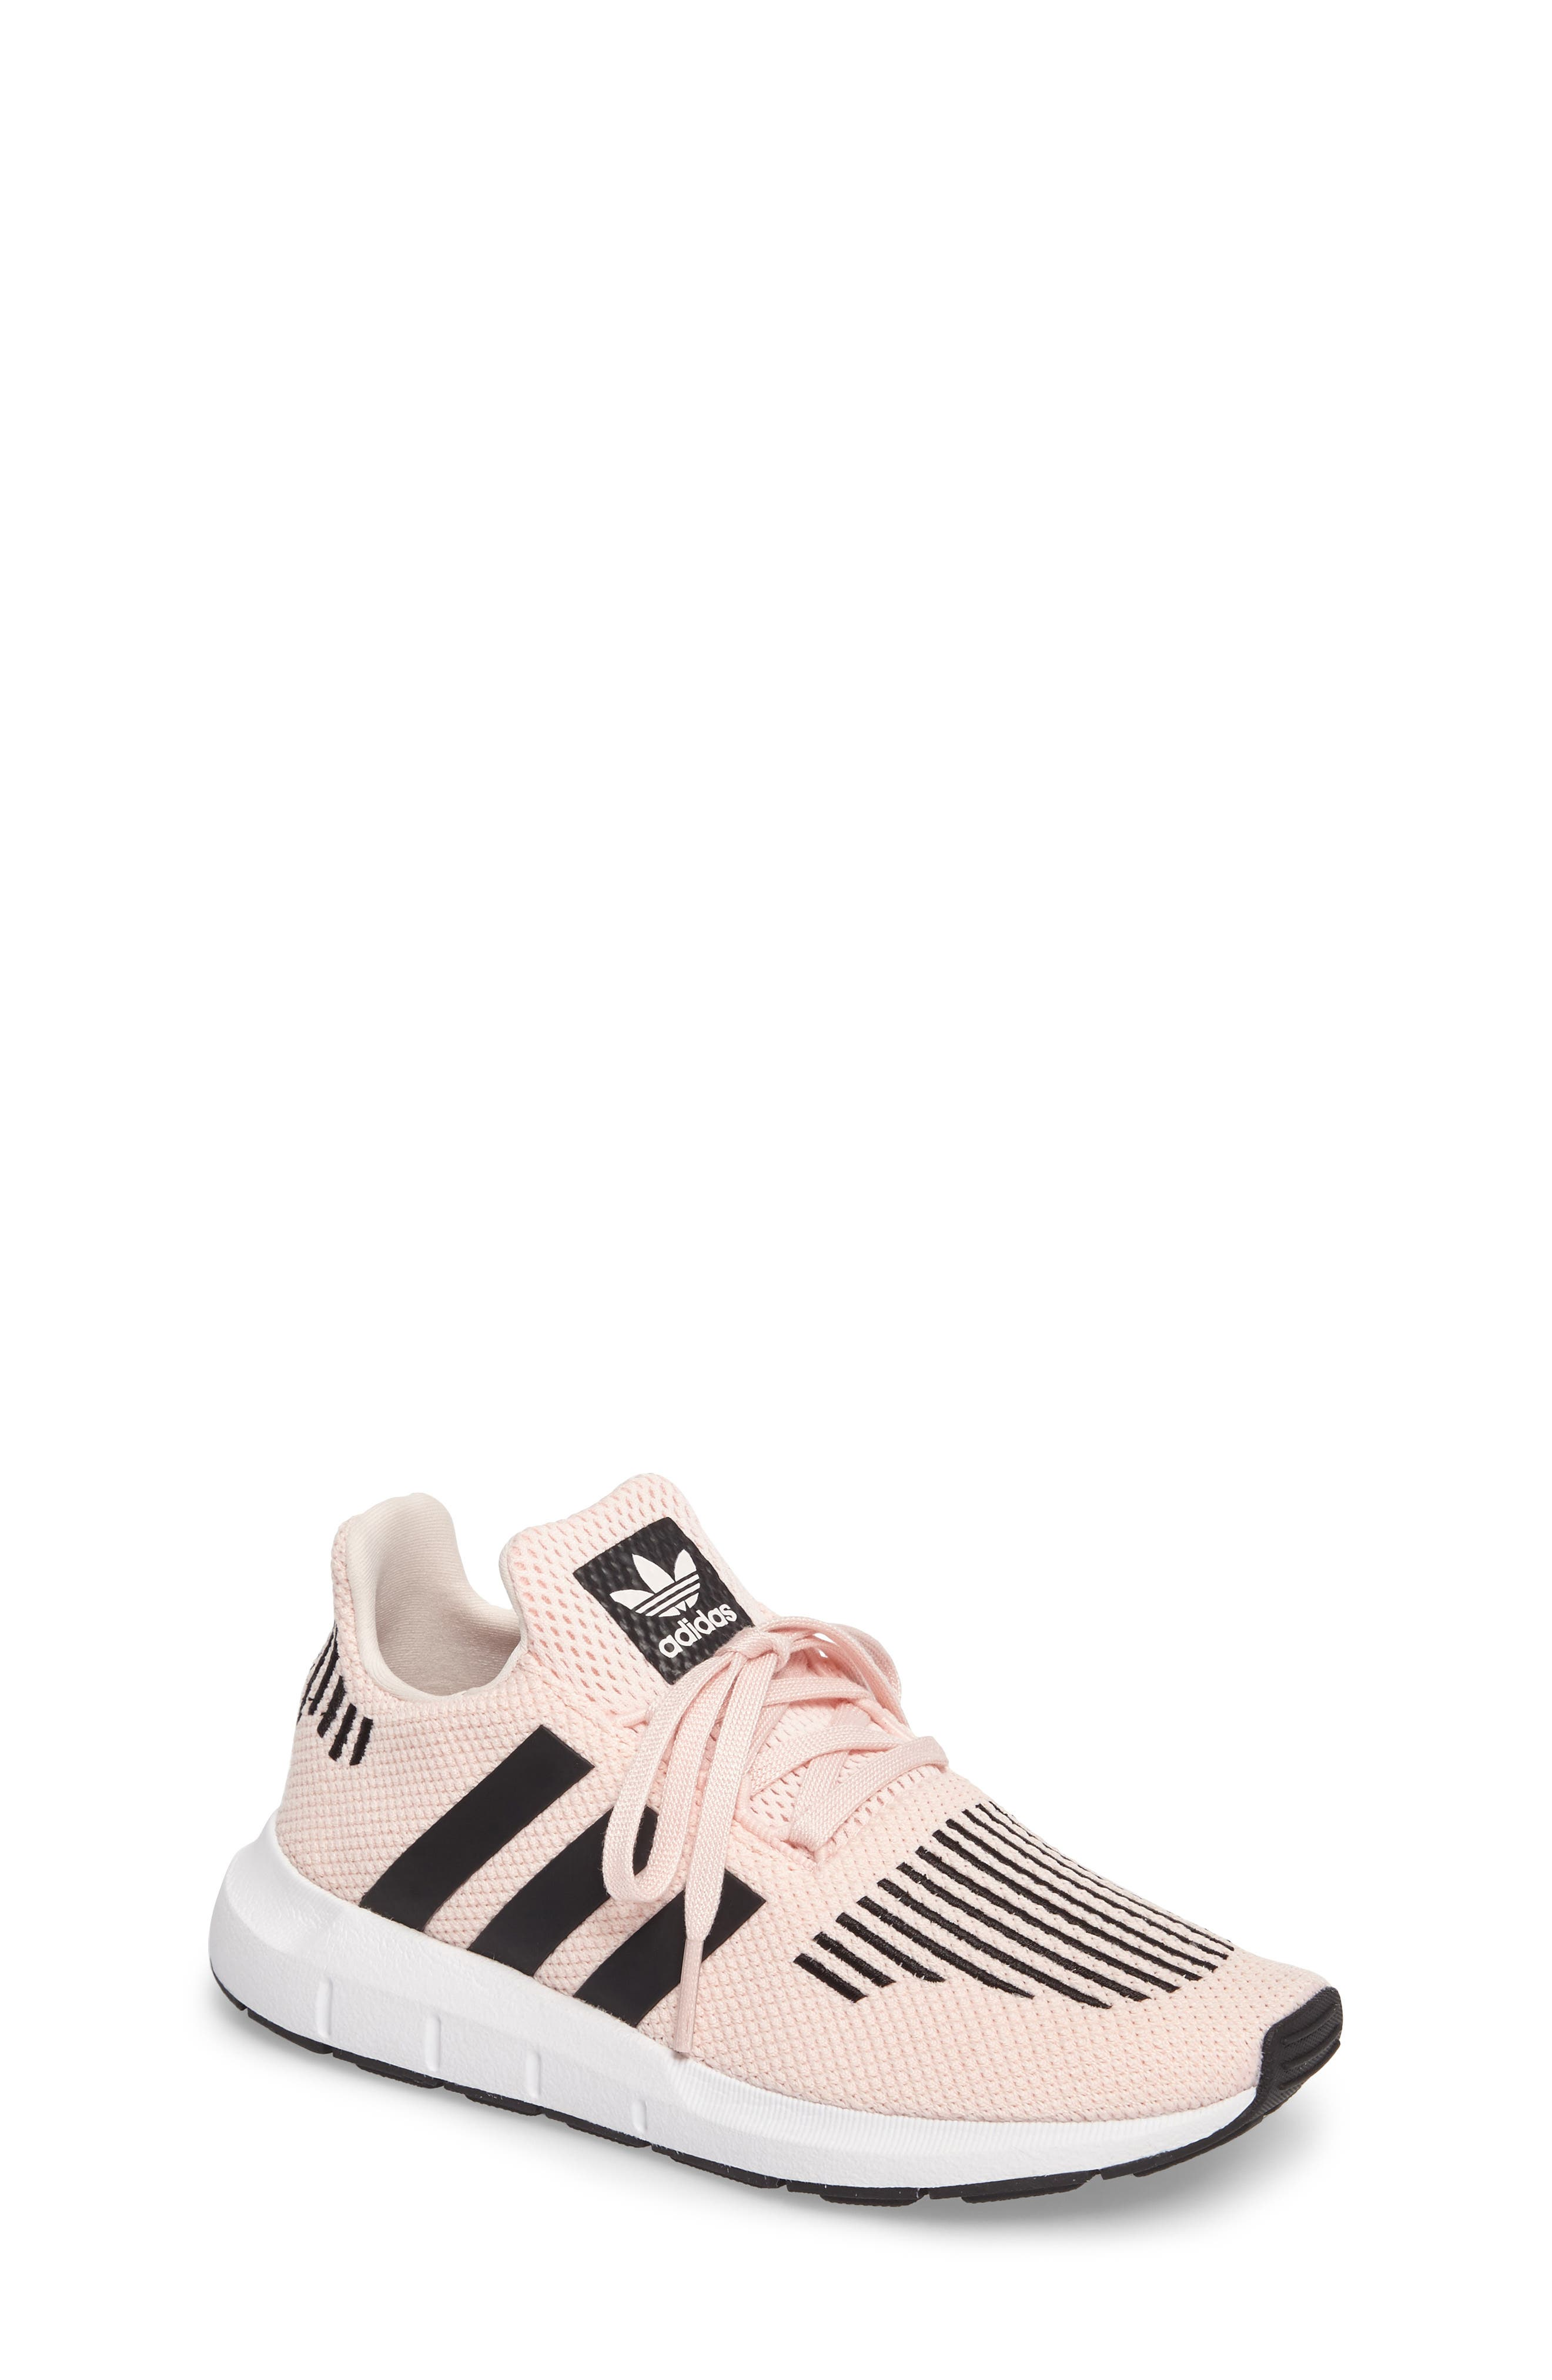 Swift Run C Sneaker,                         Main,                         color, Icey Pink/ Core Black